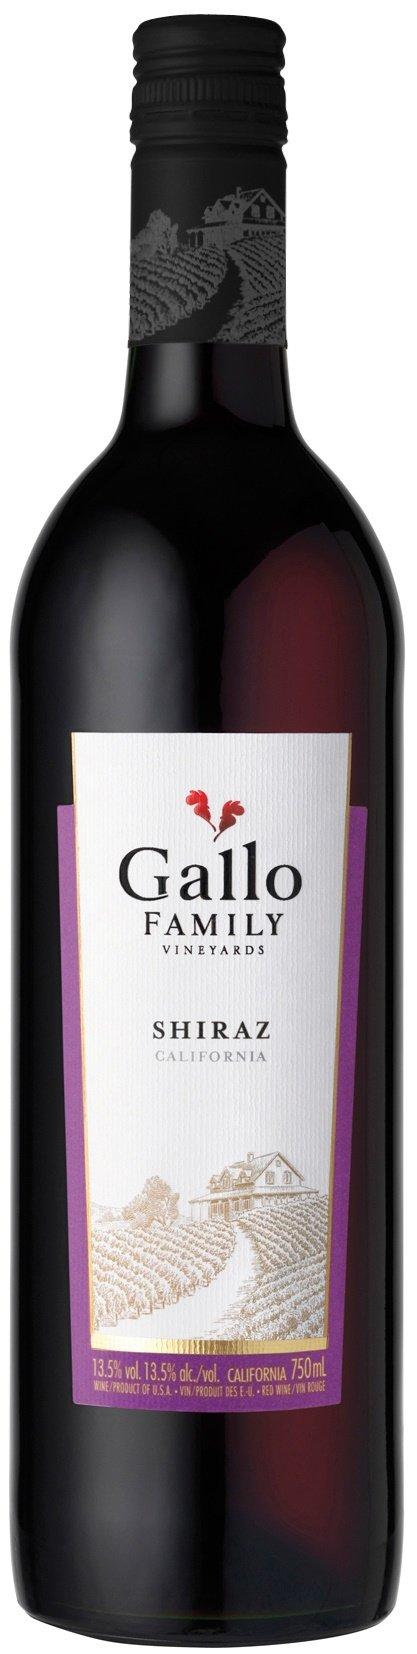 6x-075l-2016er-E-J-Gallo-Family-Vineyards-Shiraz-Kalifornien-Rotwein-trocken